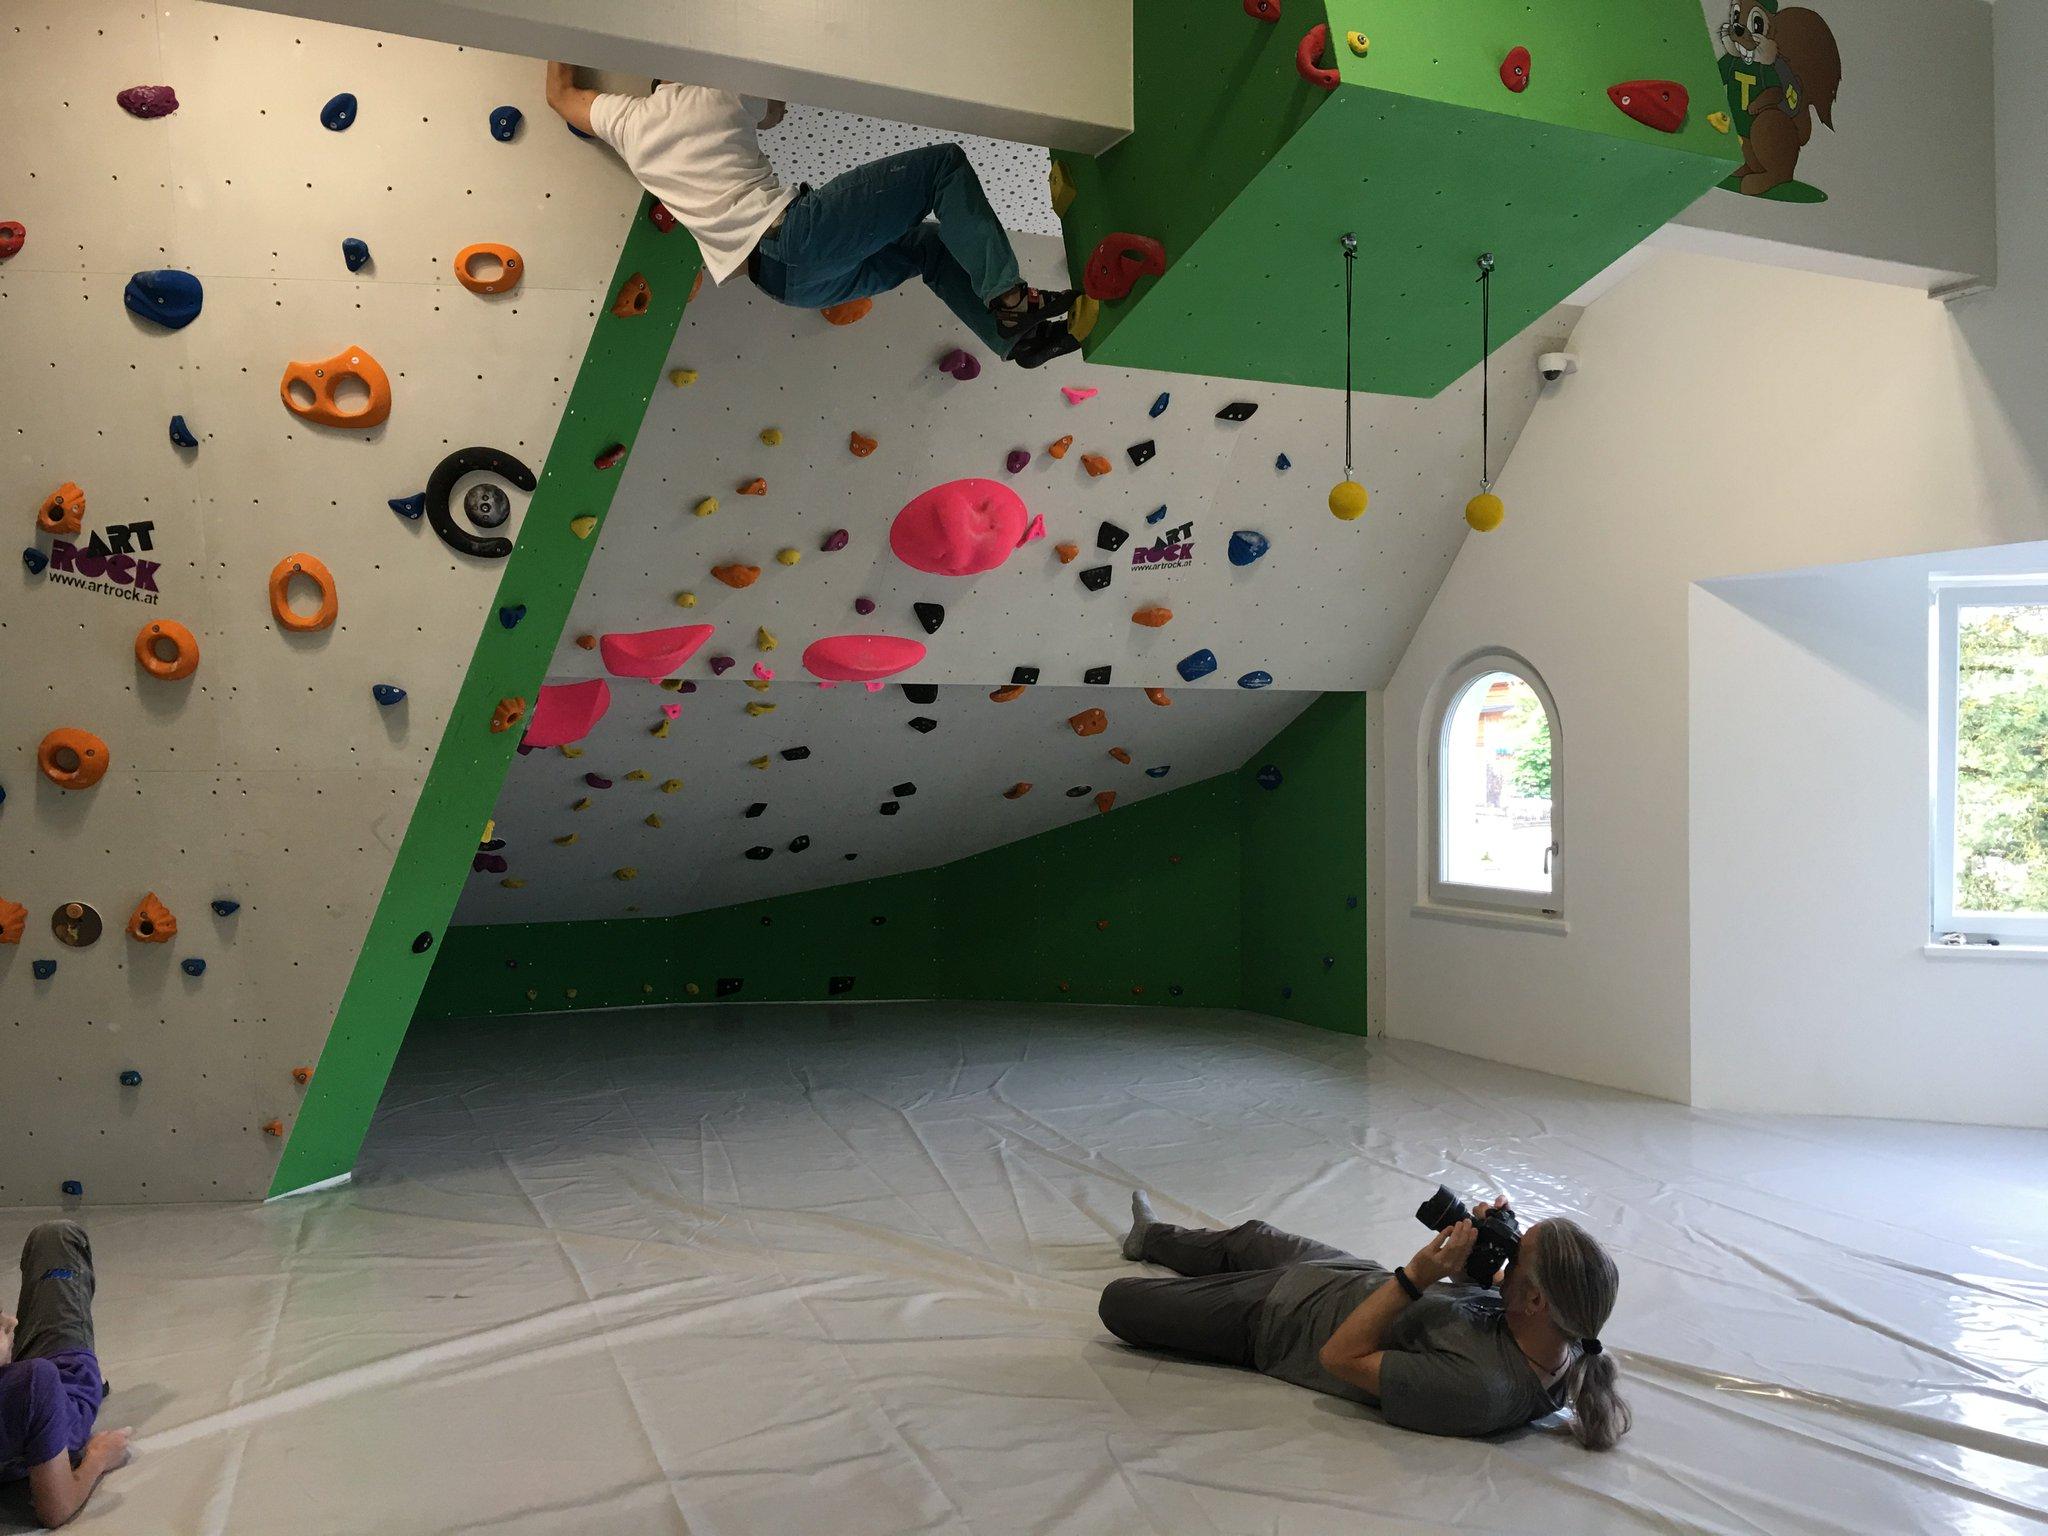 Der @HDRmeurer macht es sich heute bequem... in der Kletterhalle #meurers #TannheimerTal https://t.co/iCJMhPupE4